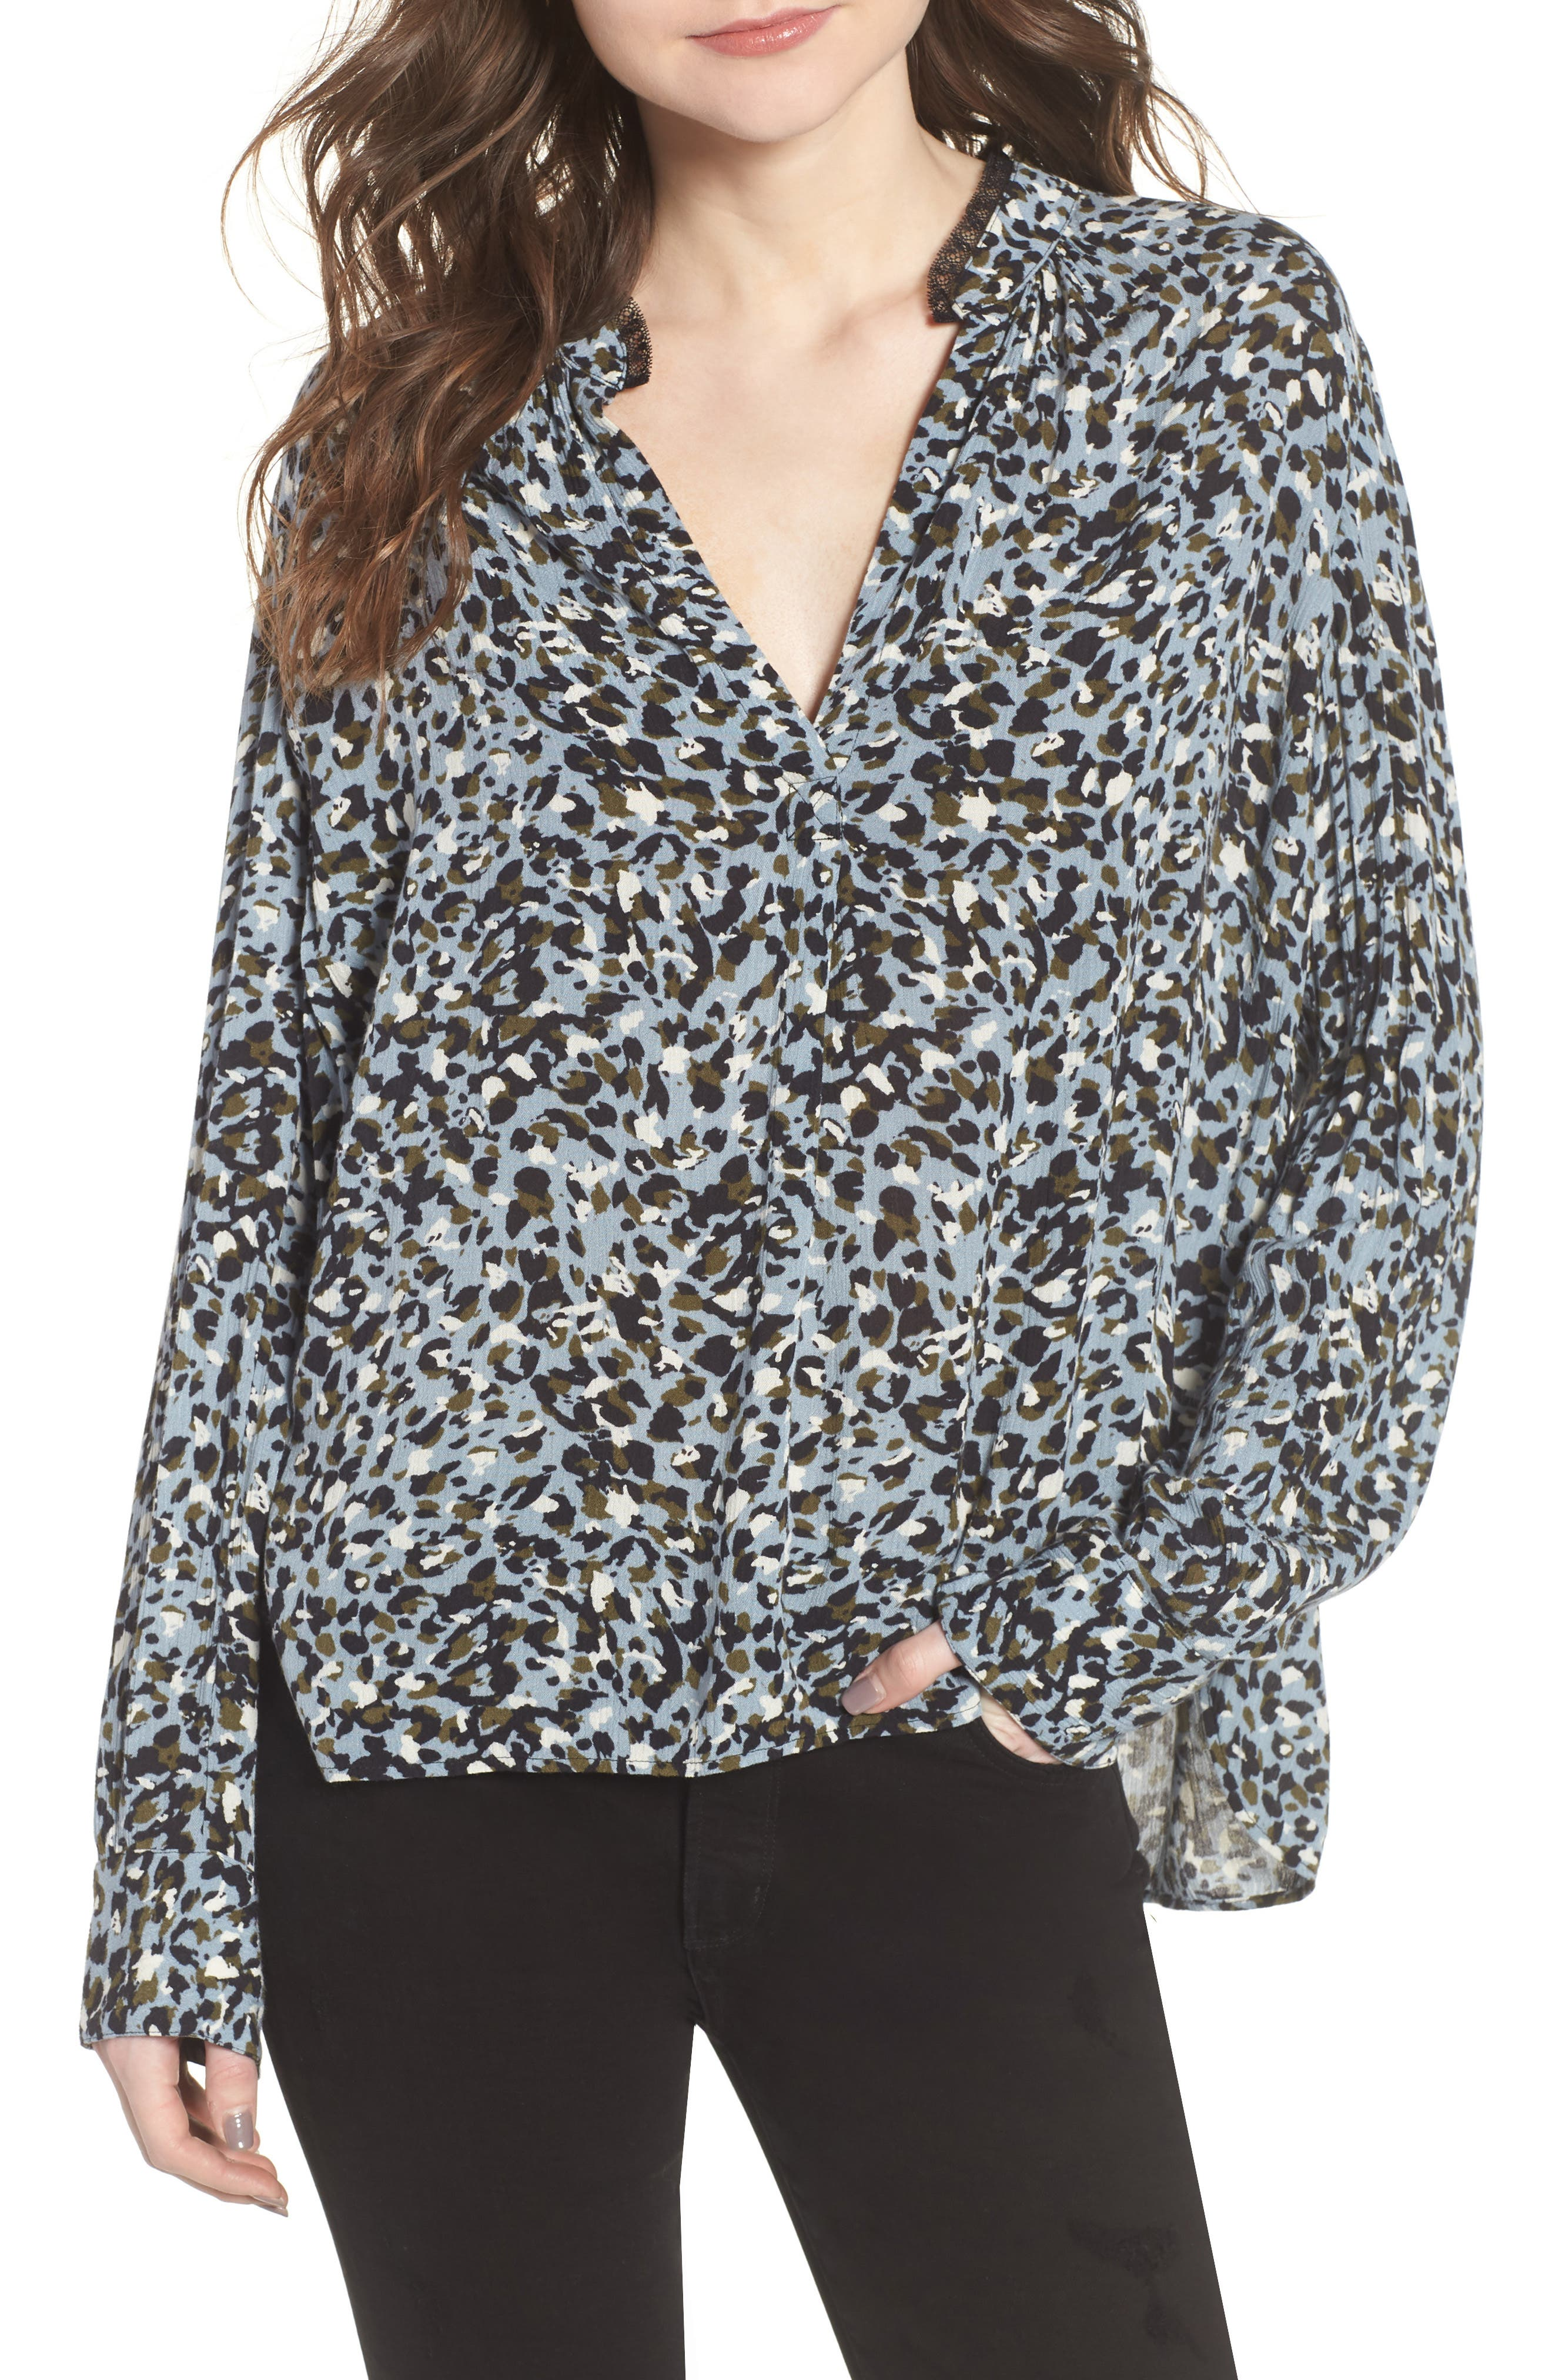 Tink Leopard Print Top,                         Main,                         color, 400